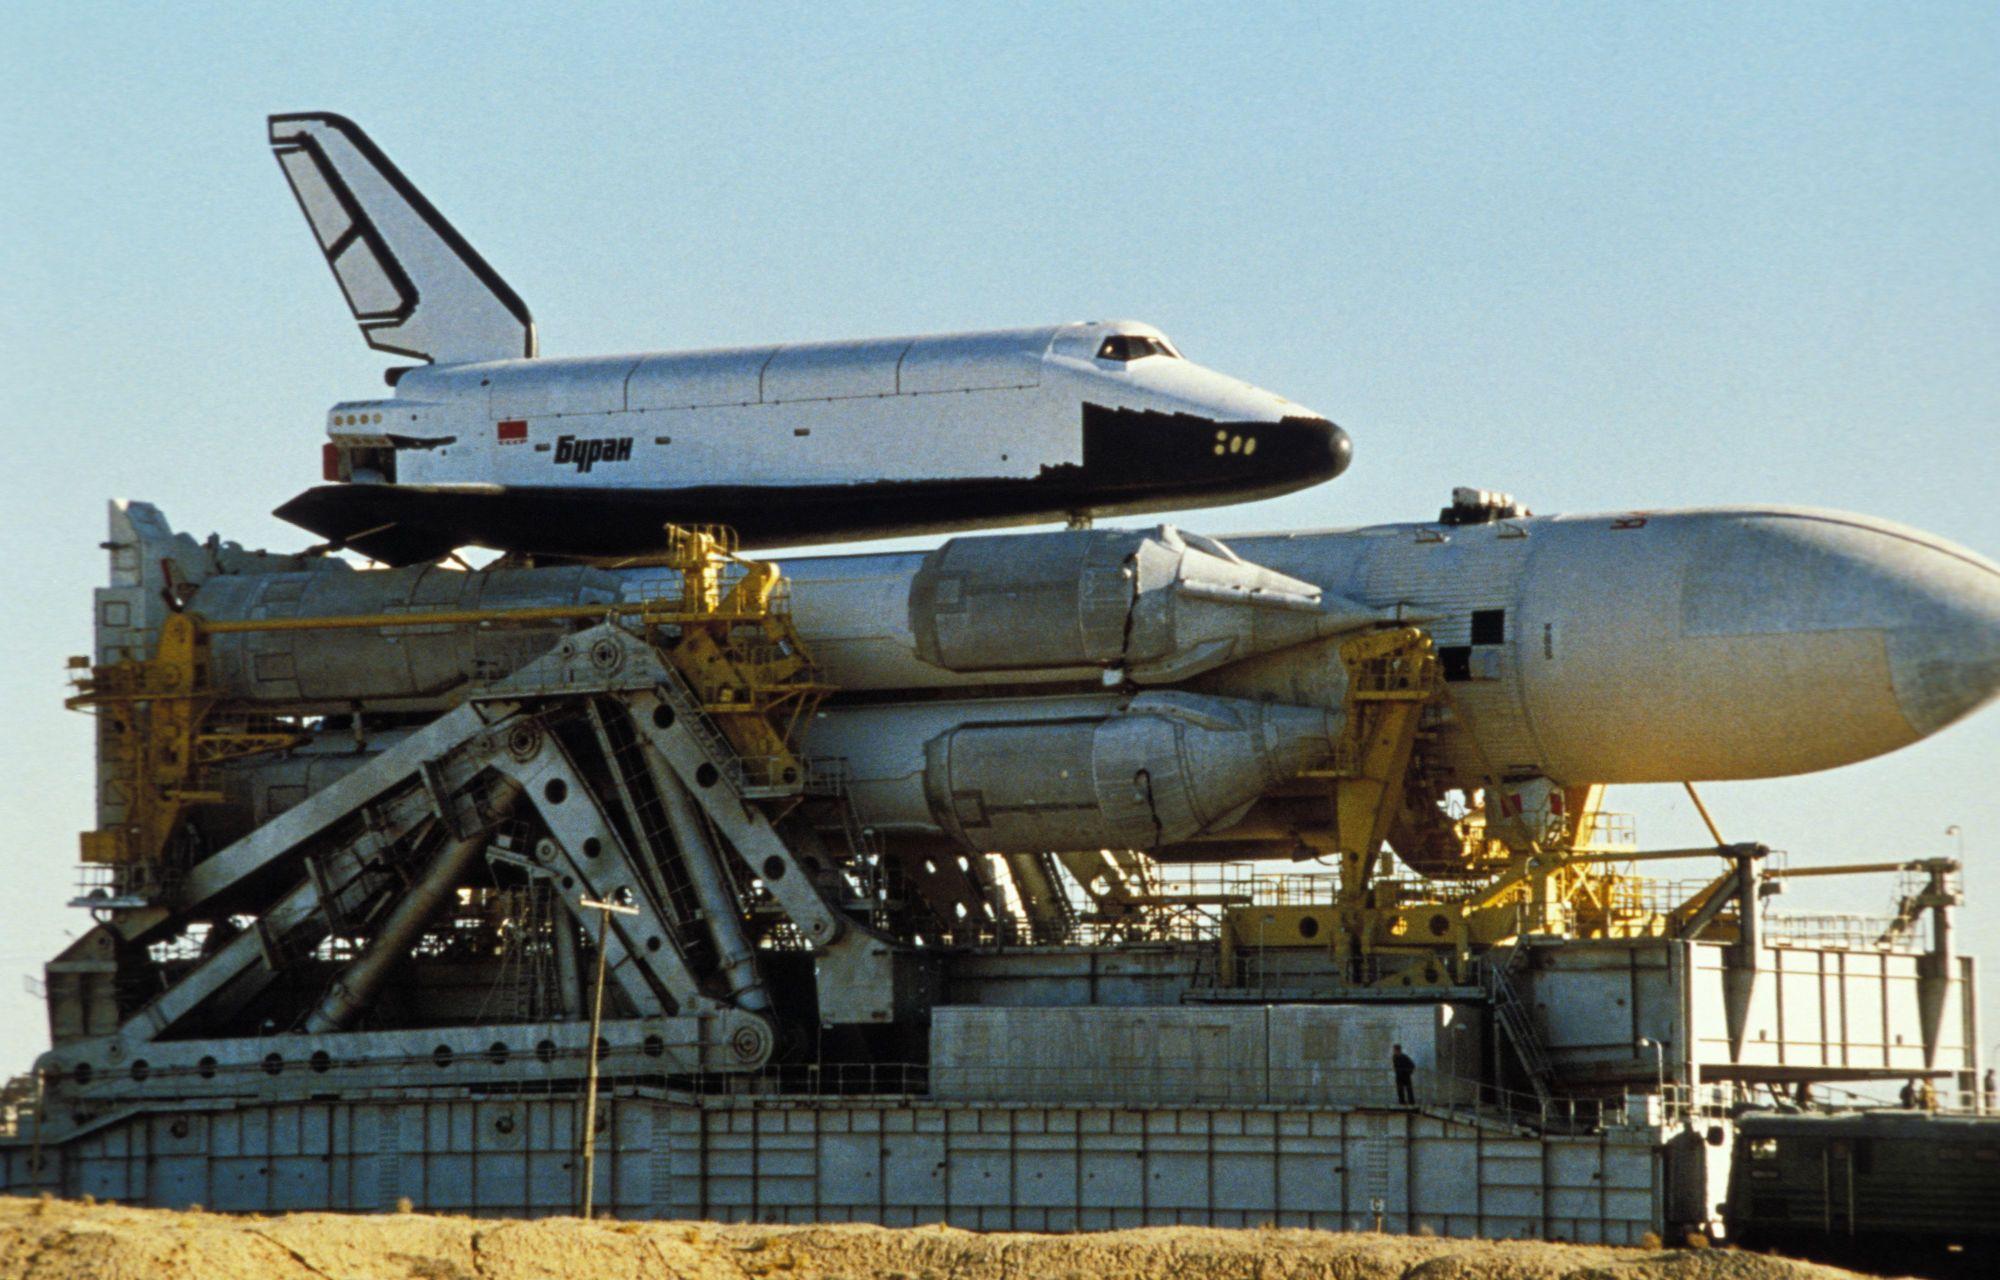 Russia's New Rocket Project Might Resurrect a Soviet-Era Colossus